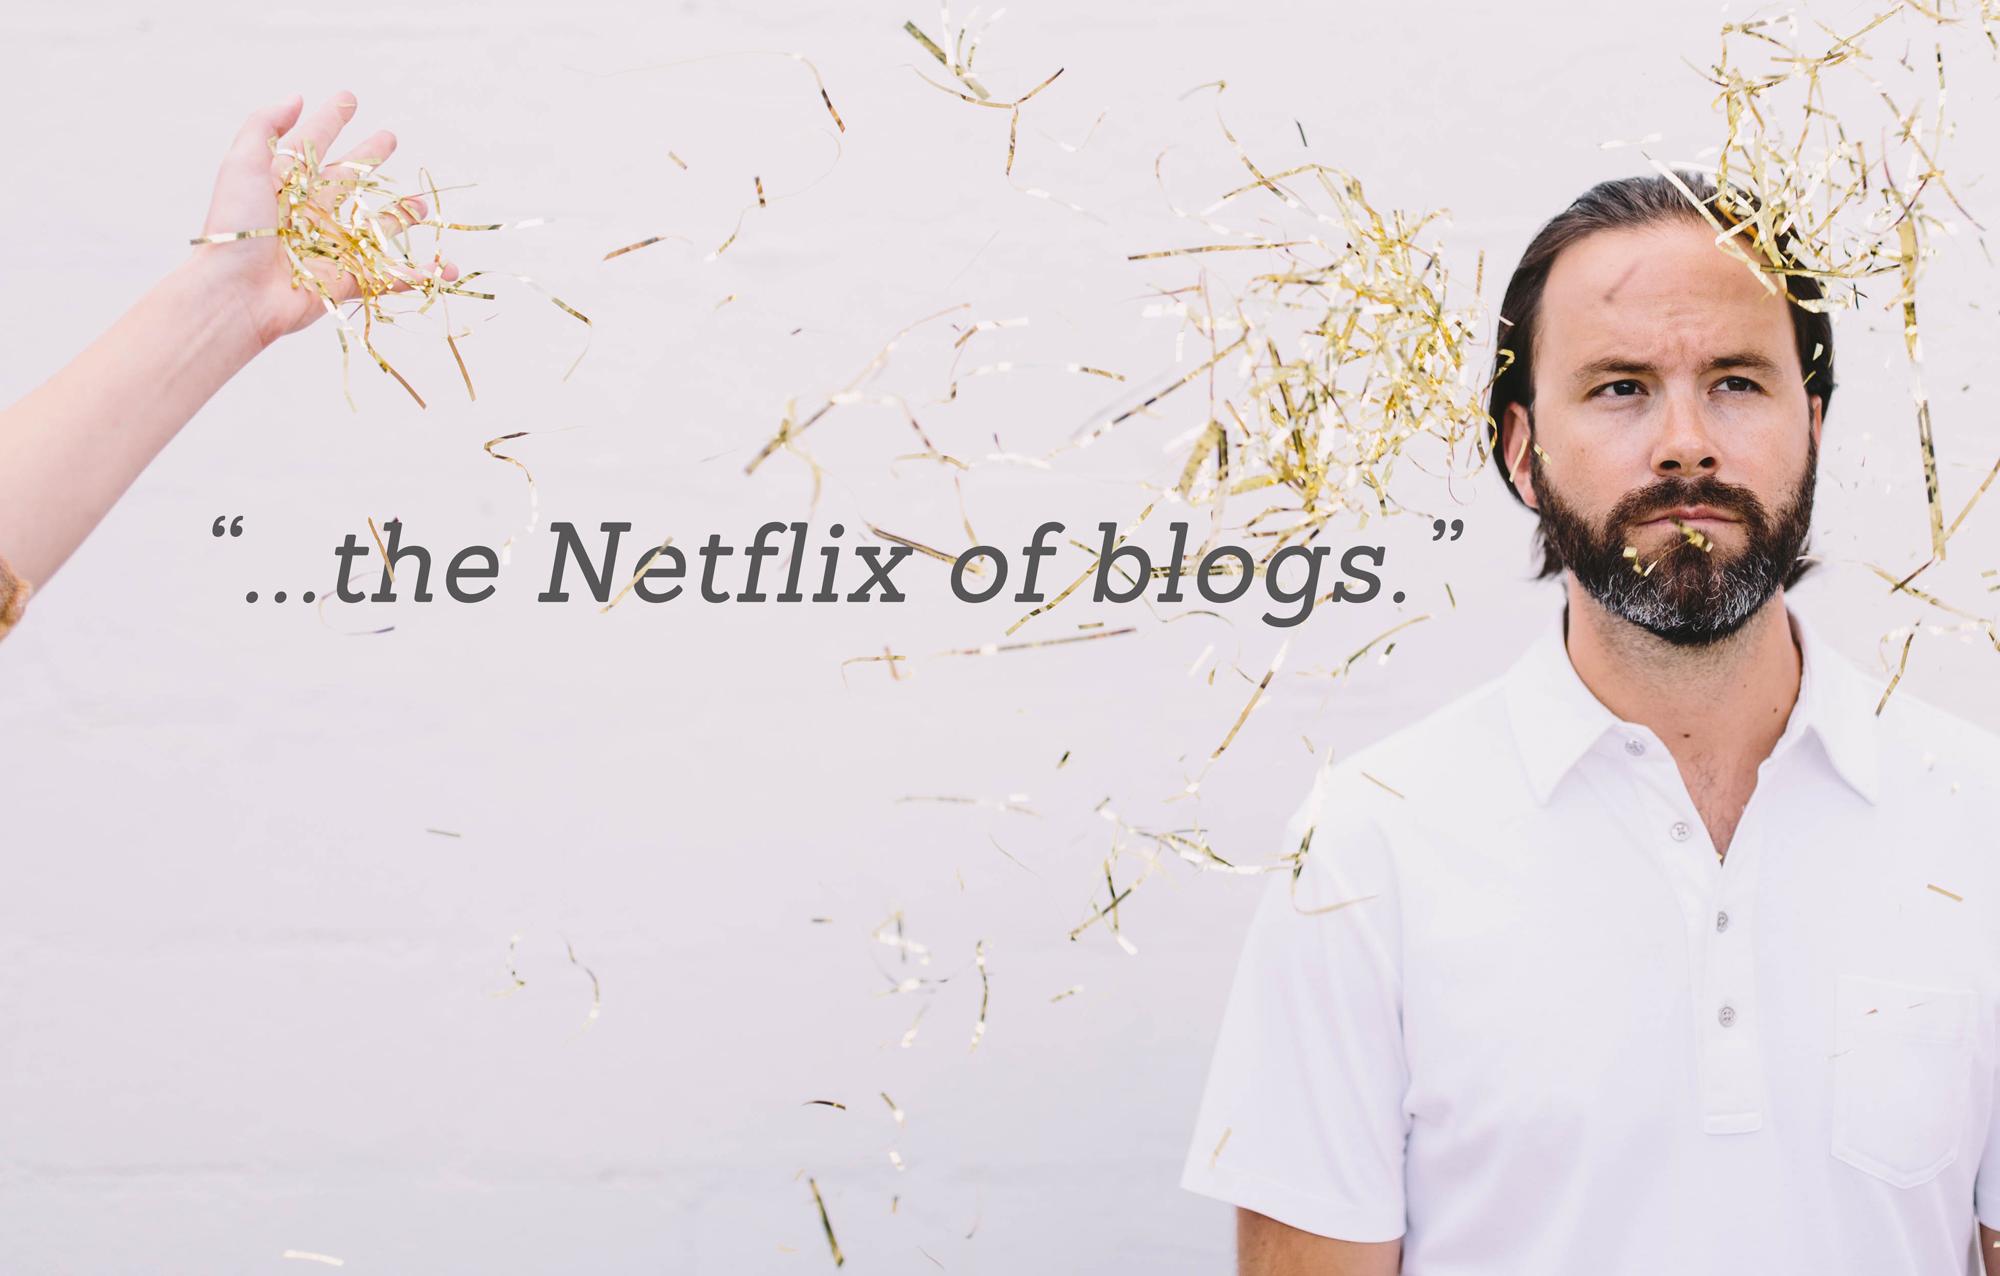 netflix of blogs - main image-small.jpg